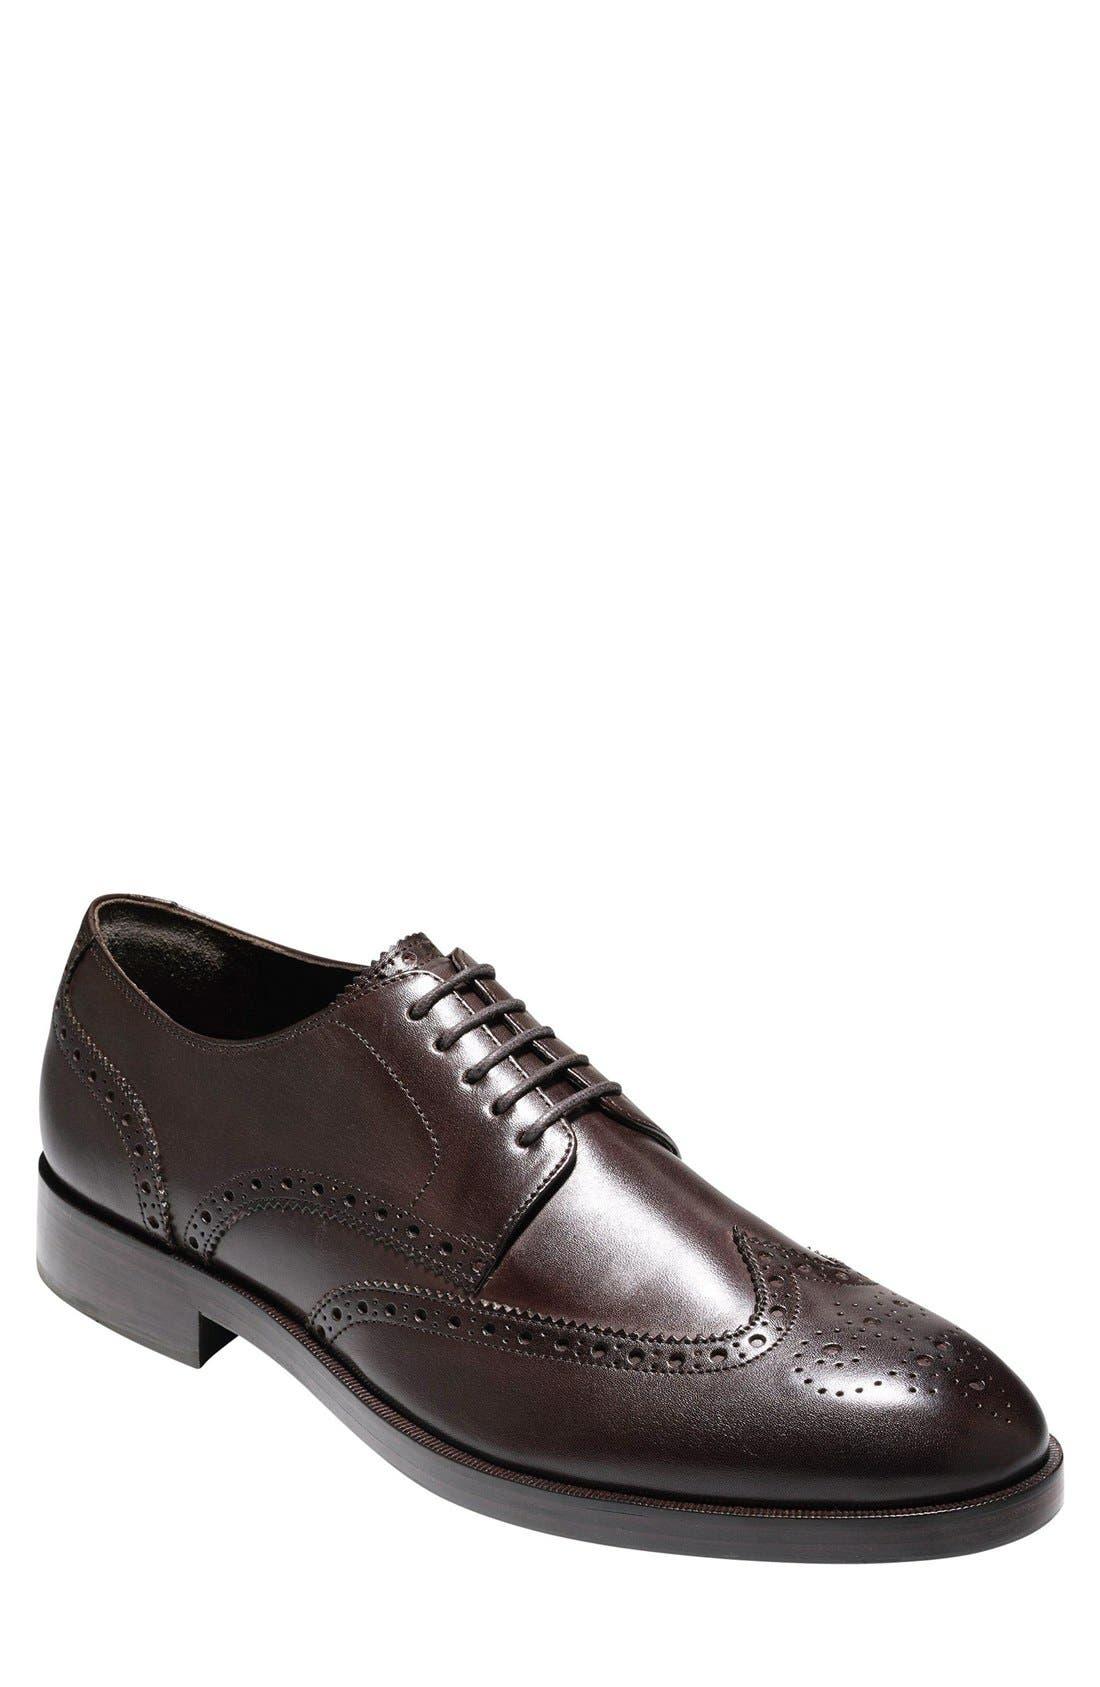 'Harrison Grand' Wingtip,                         Main,                         color, Dark Brown Leather